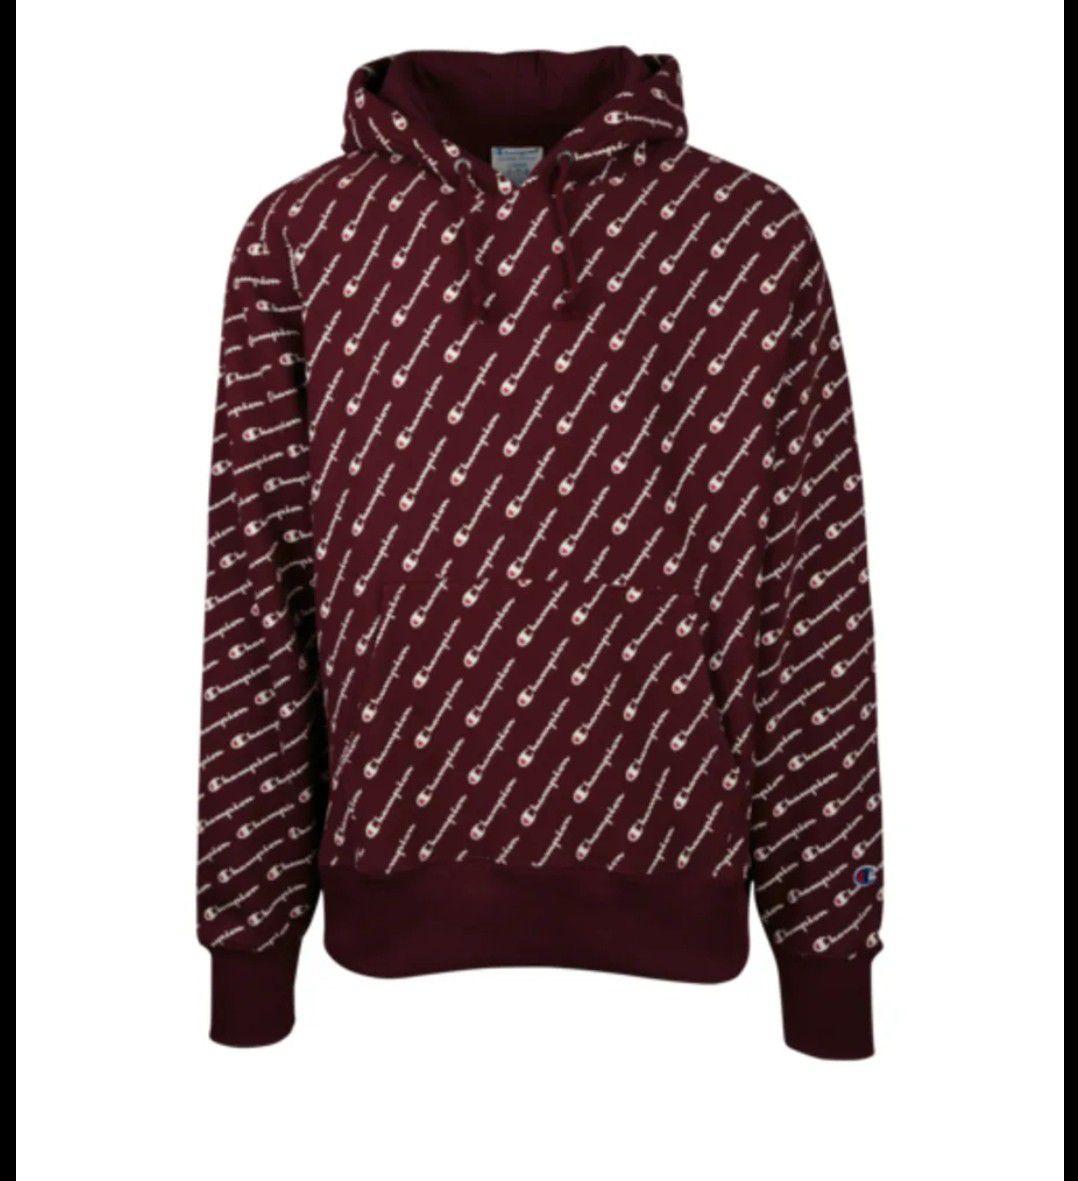 Champion hoodie